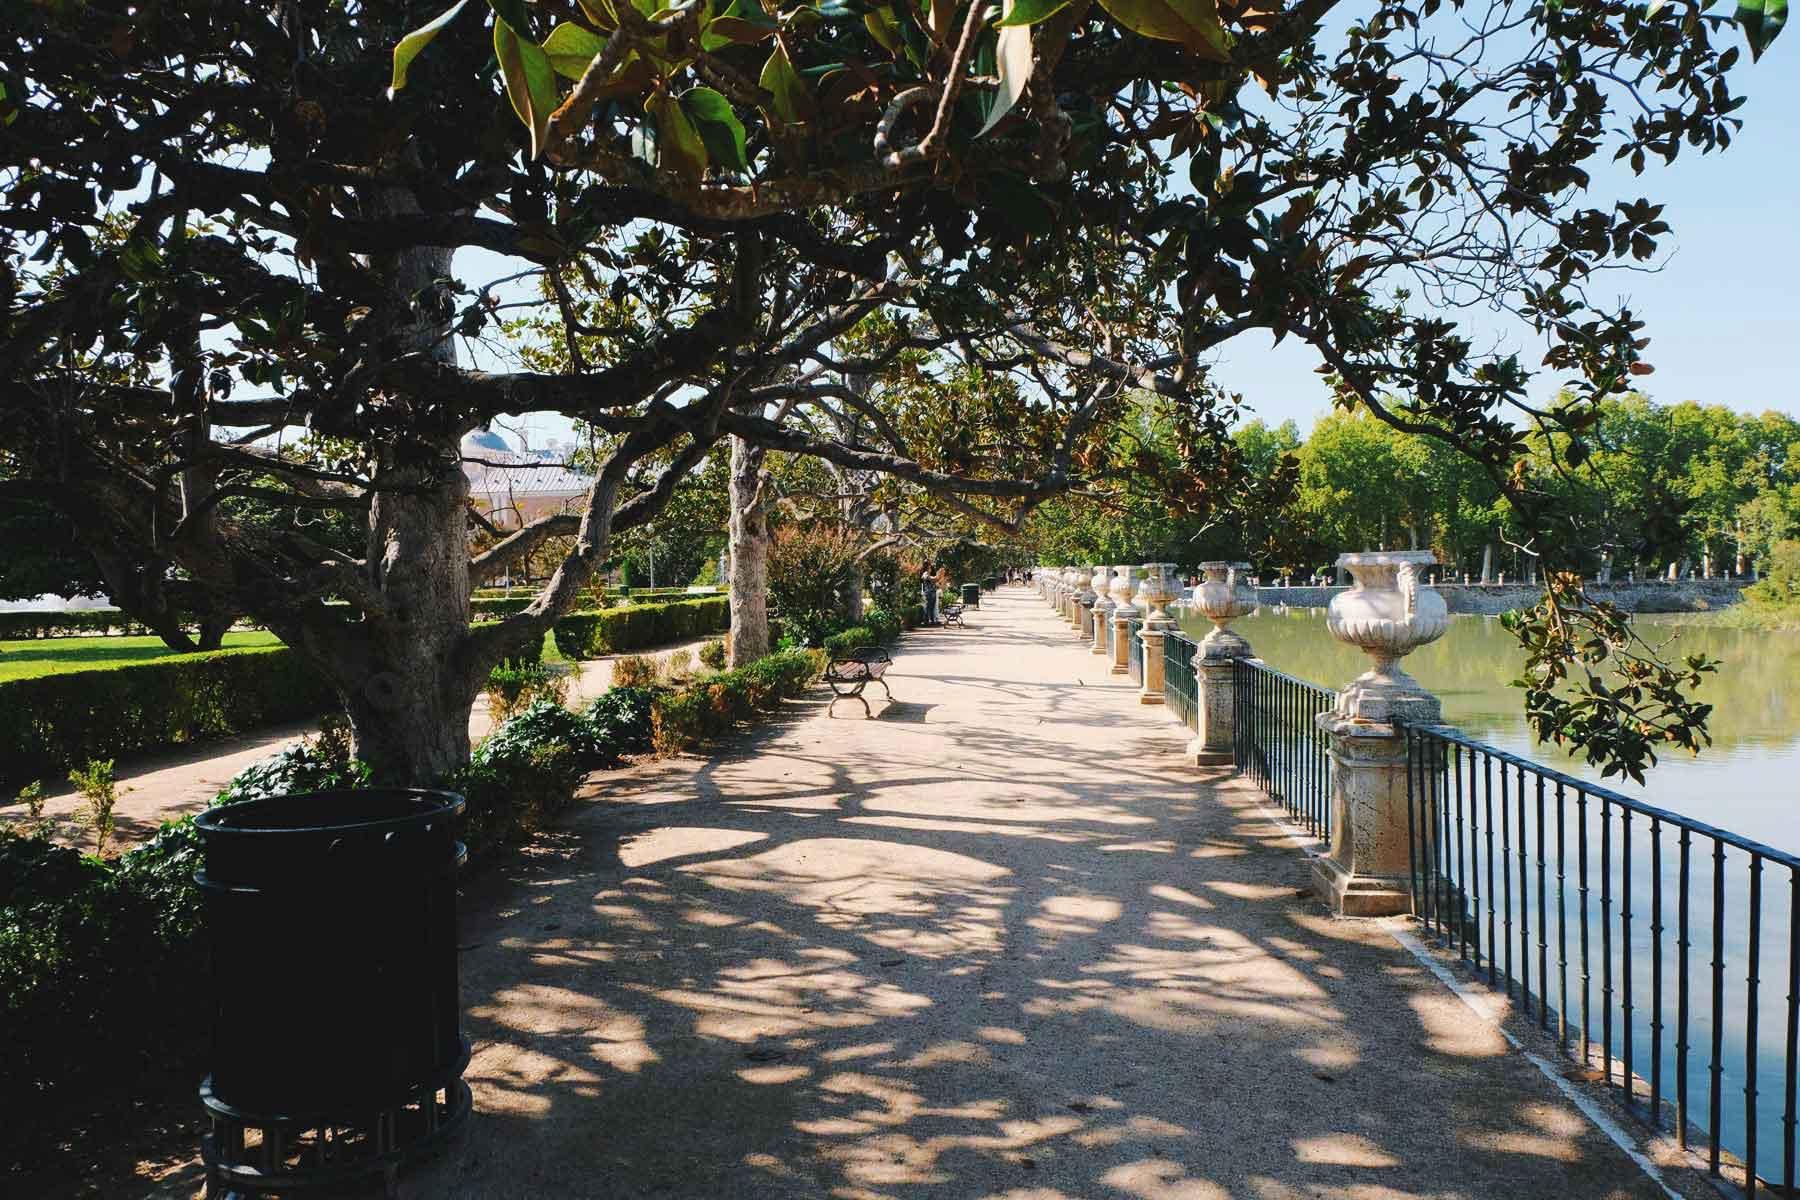 Paseo junto al rio Tajo. / Sidewalk next to Tagus River.